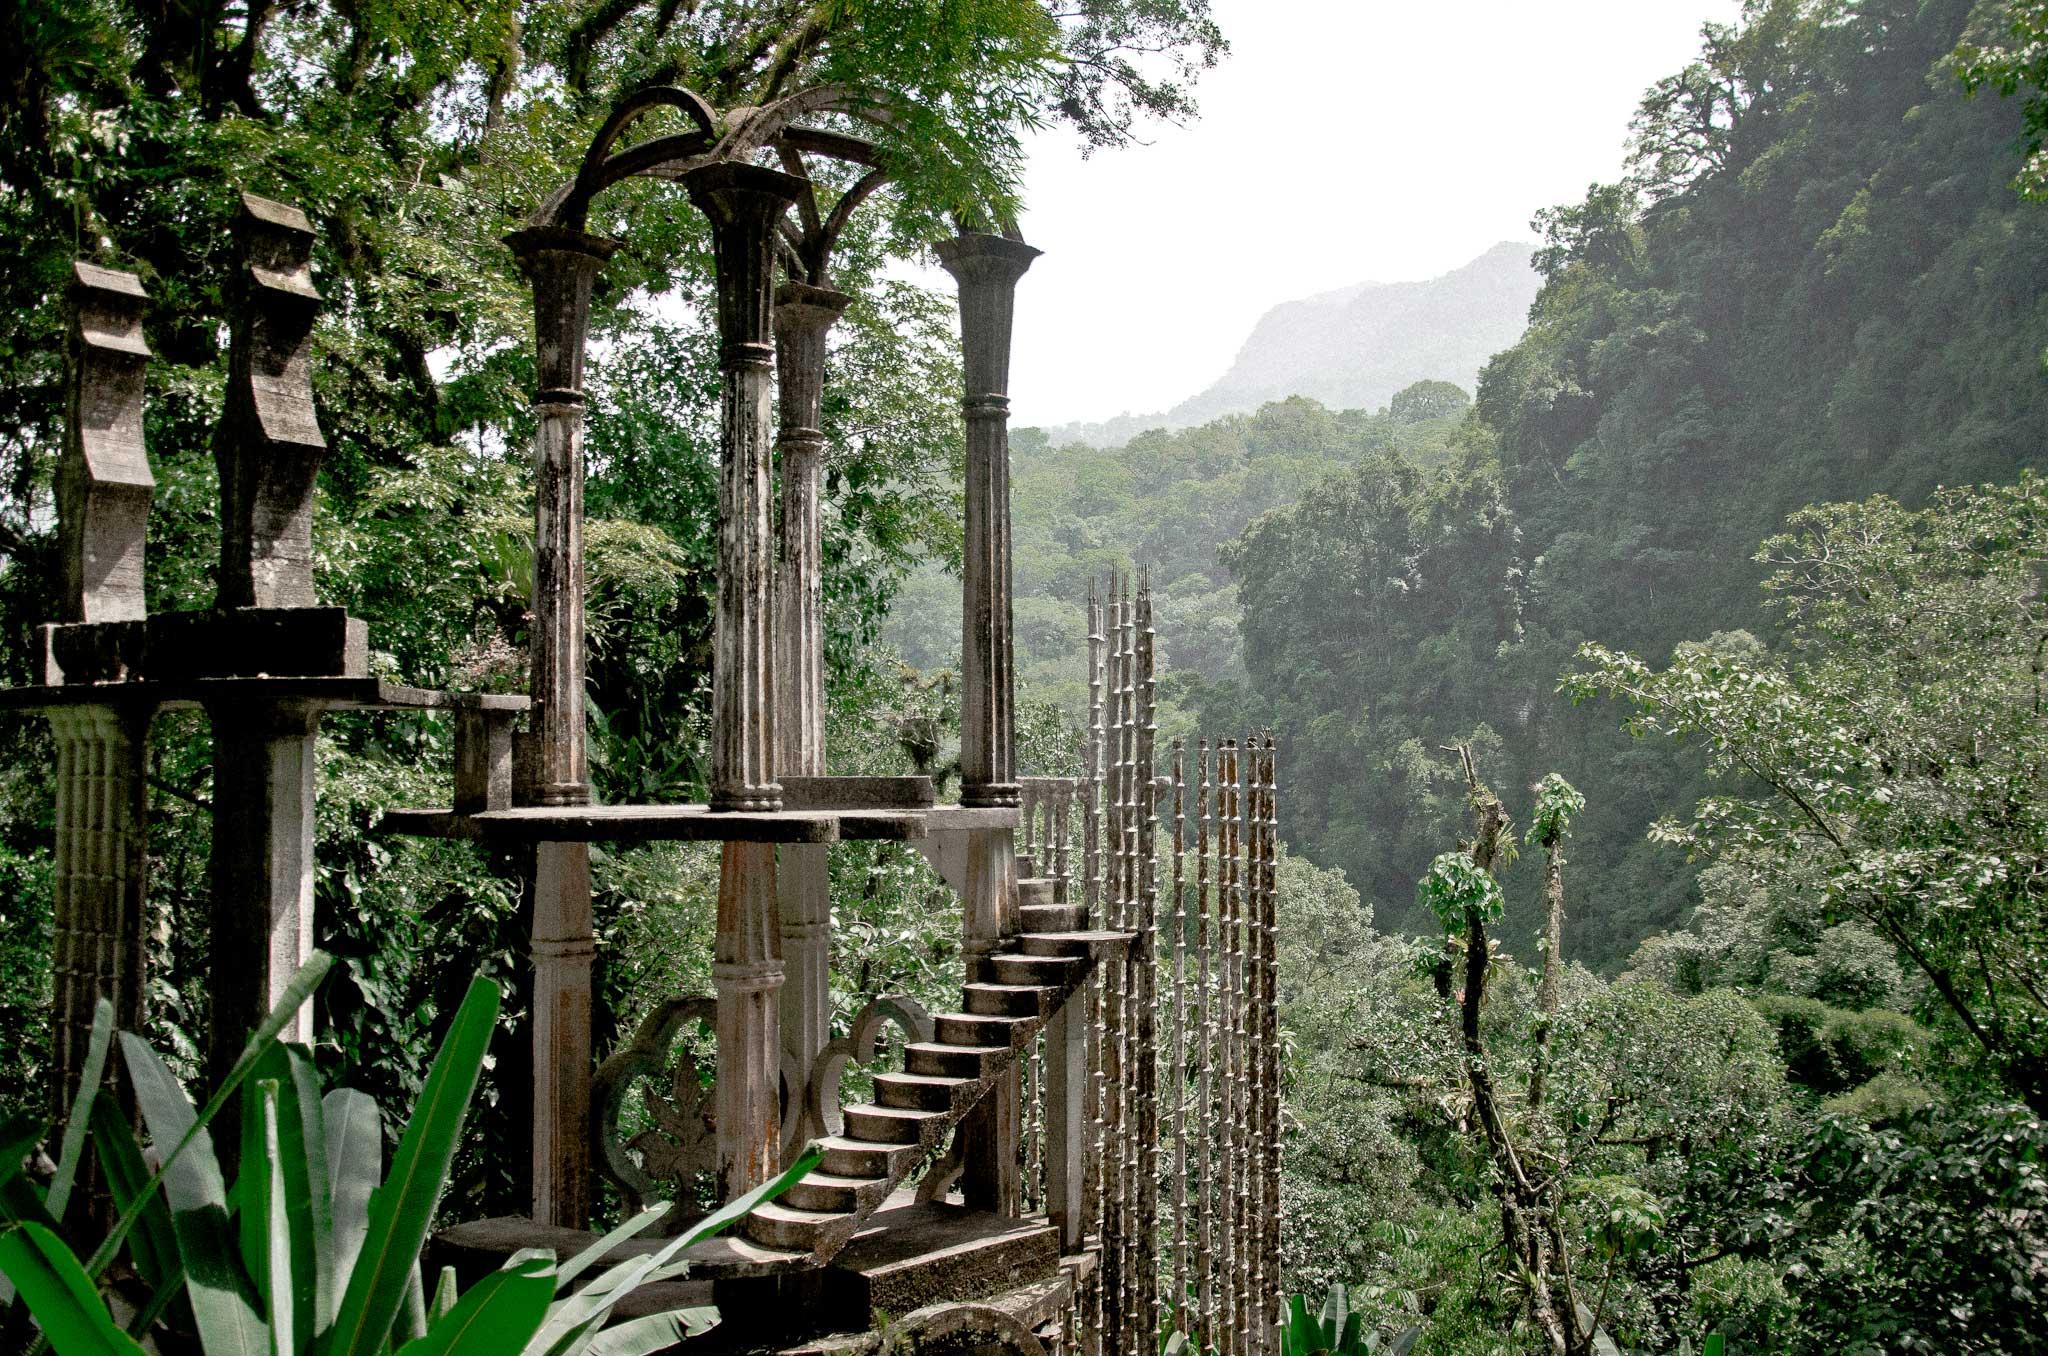 Recomendaciones De Un Local Para Viajar A La Huasteca Potosina Kalot